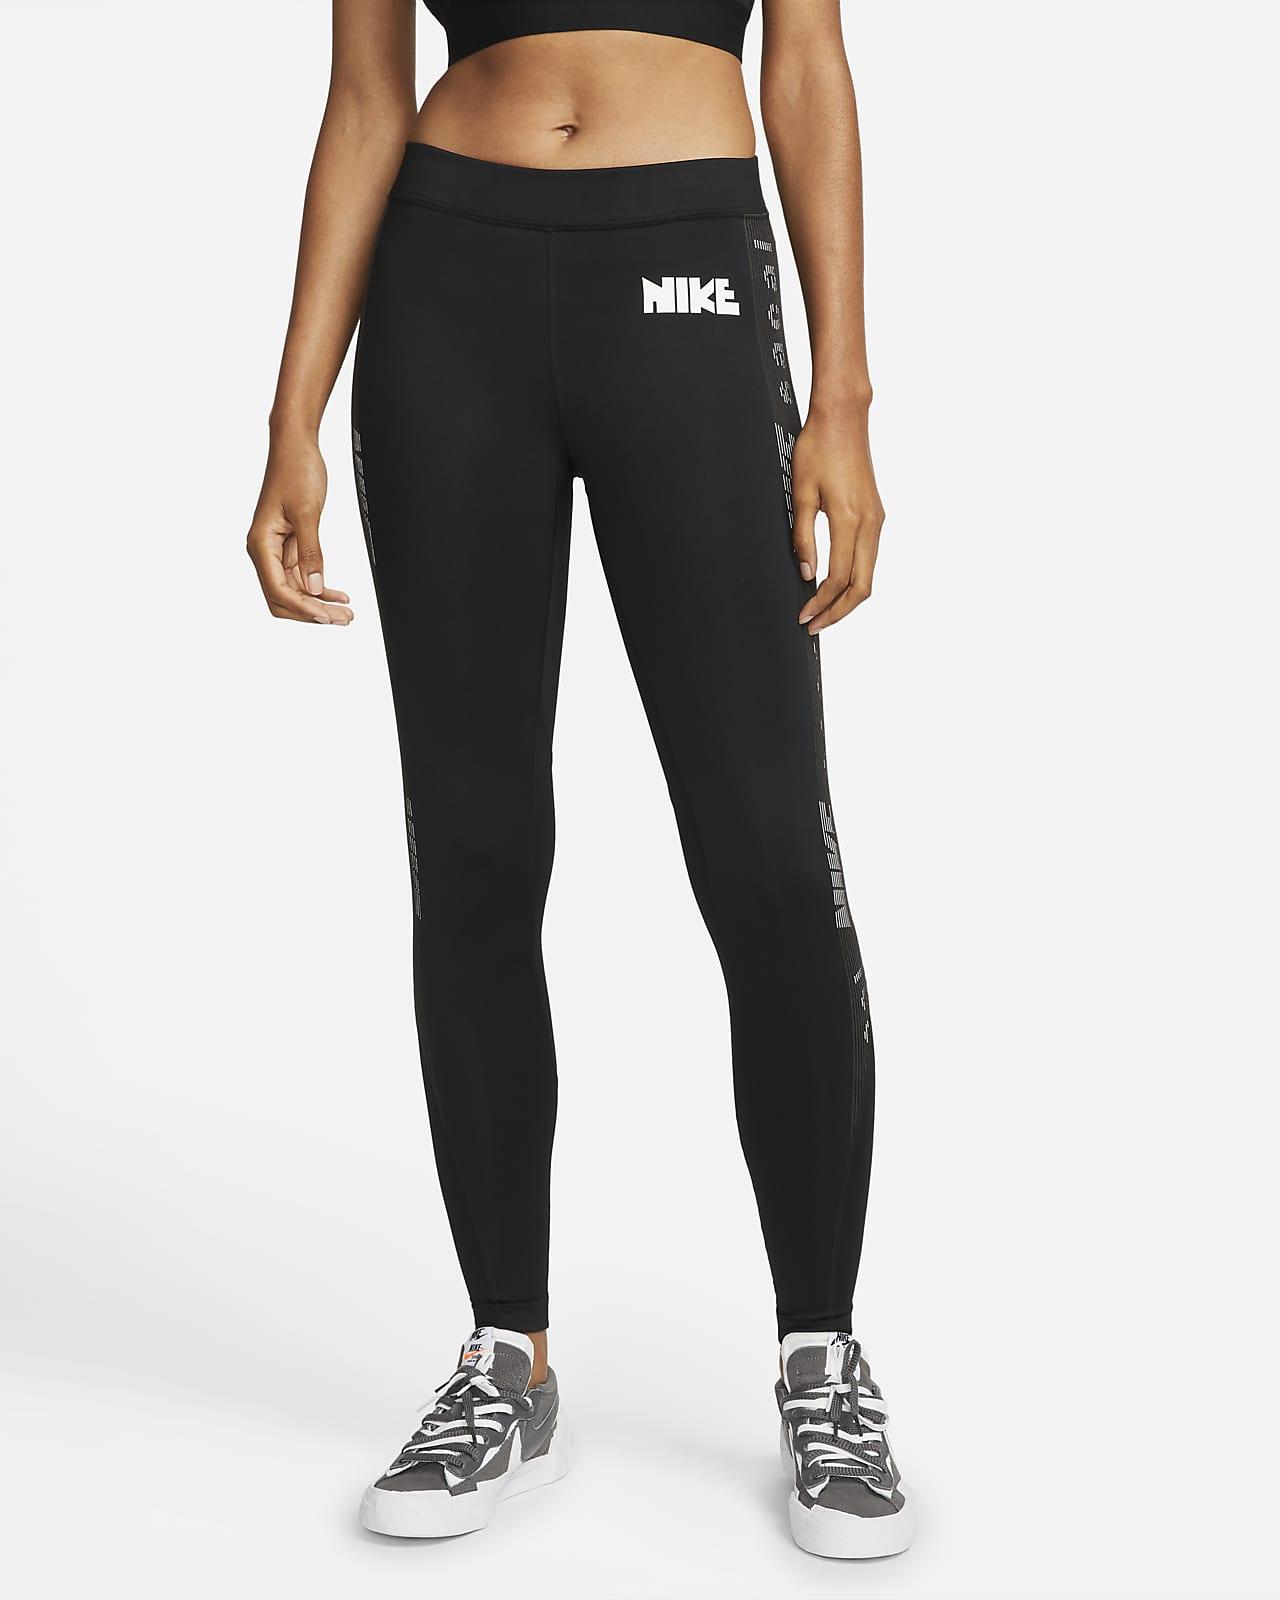 Nike x sacai Normal Belli Tayt